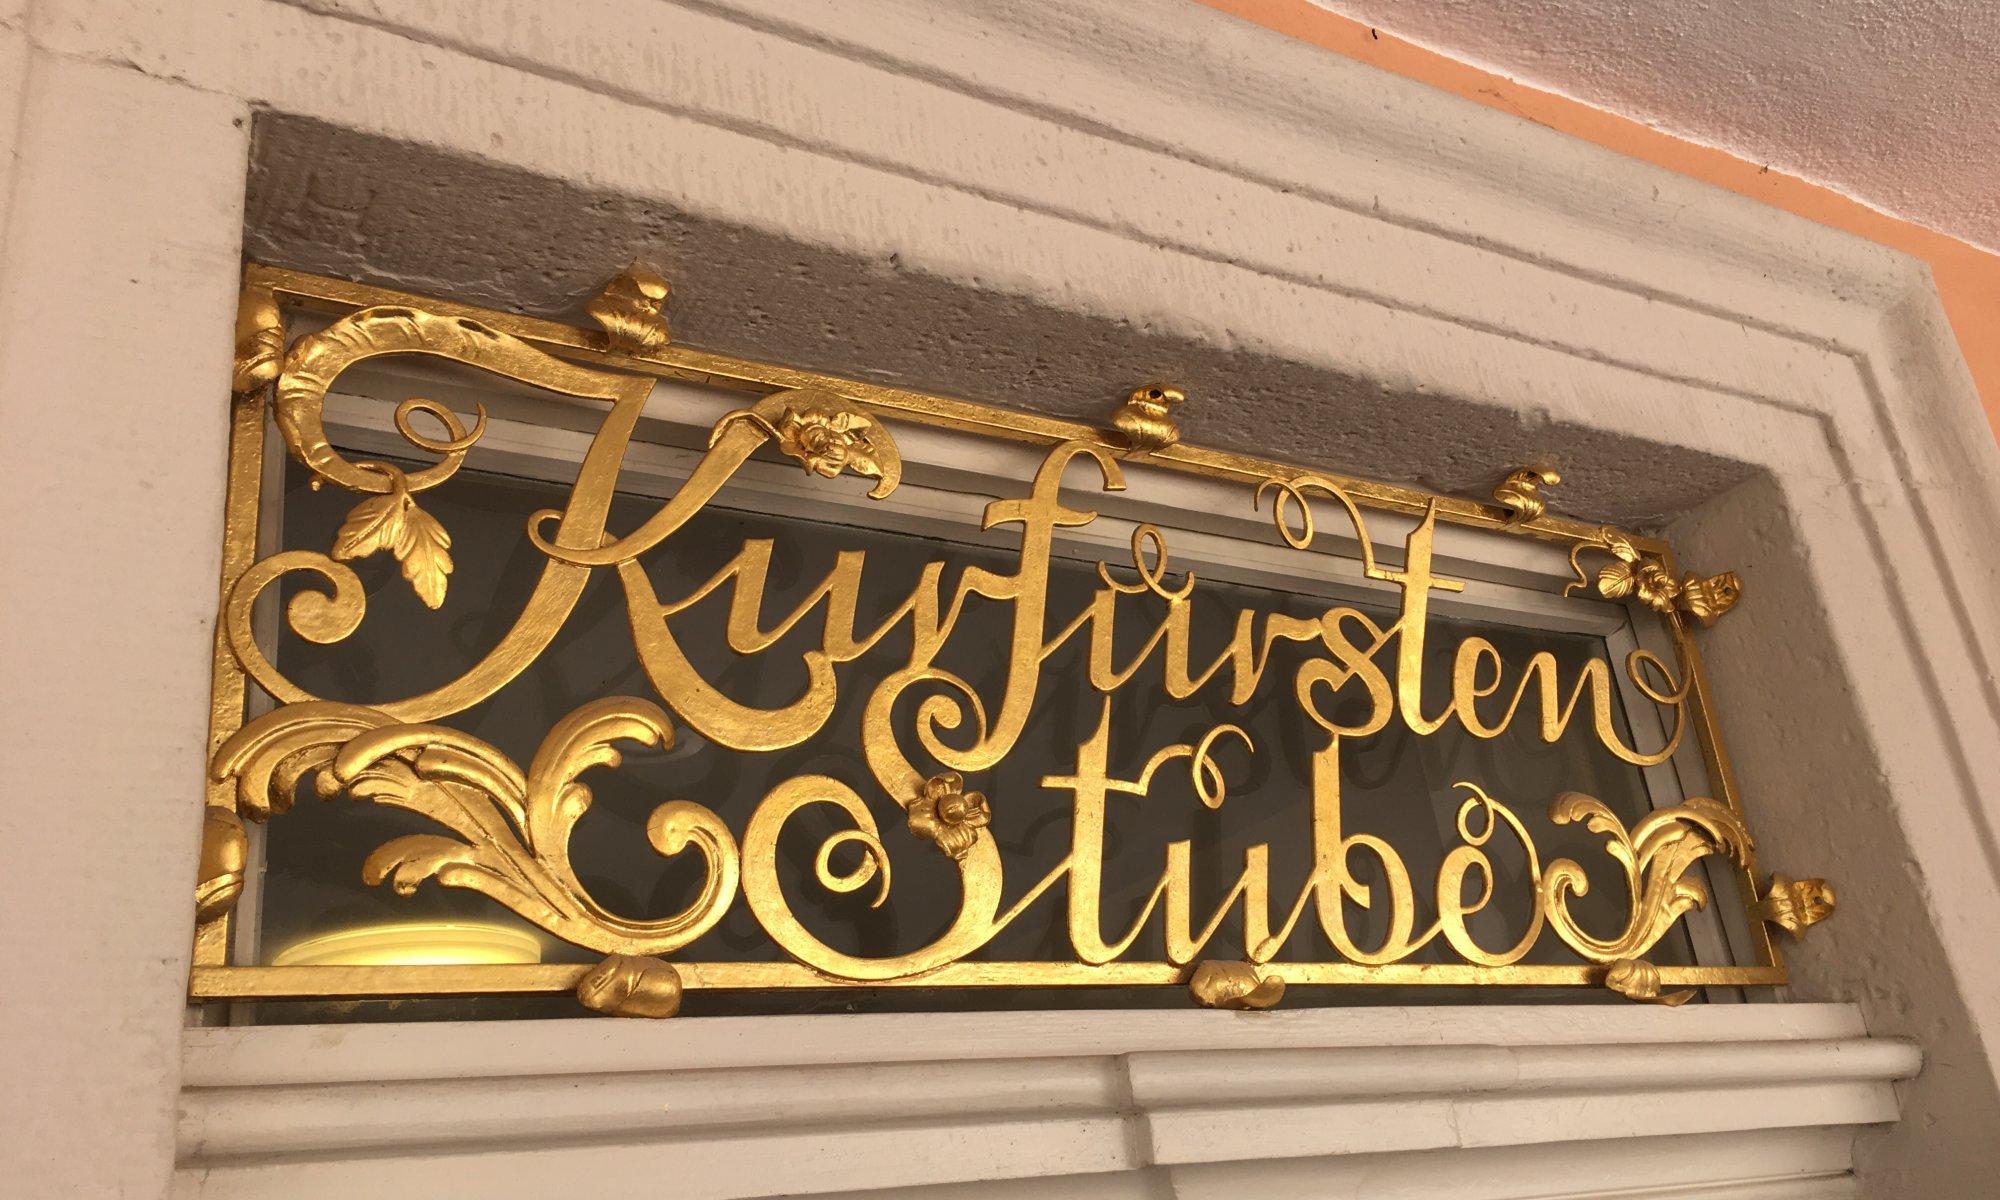 Kurfürstenstube, Schwetzingen